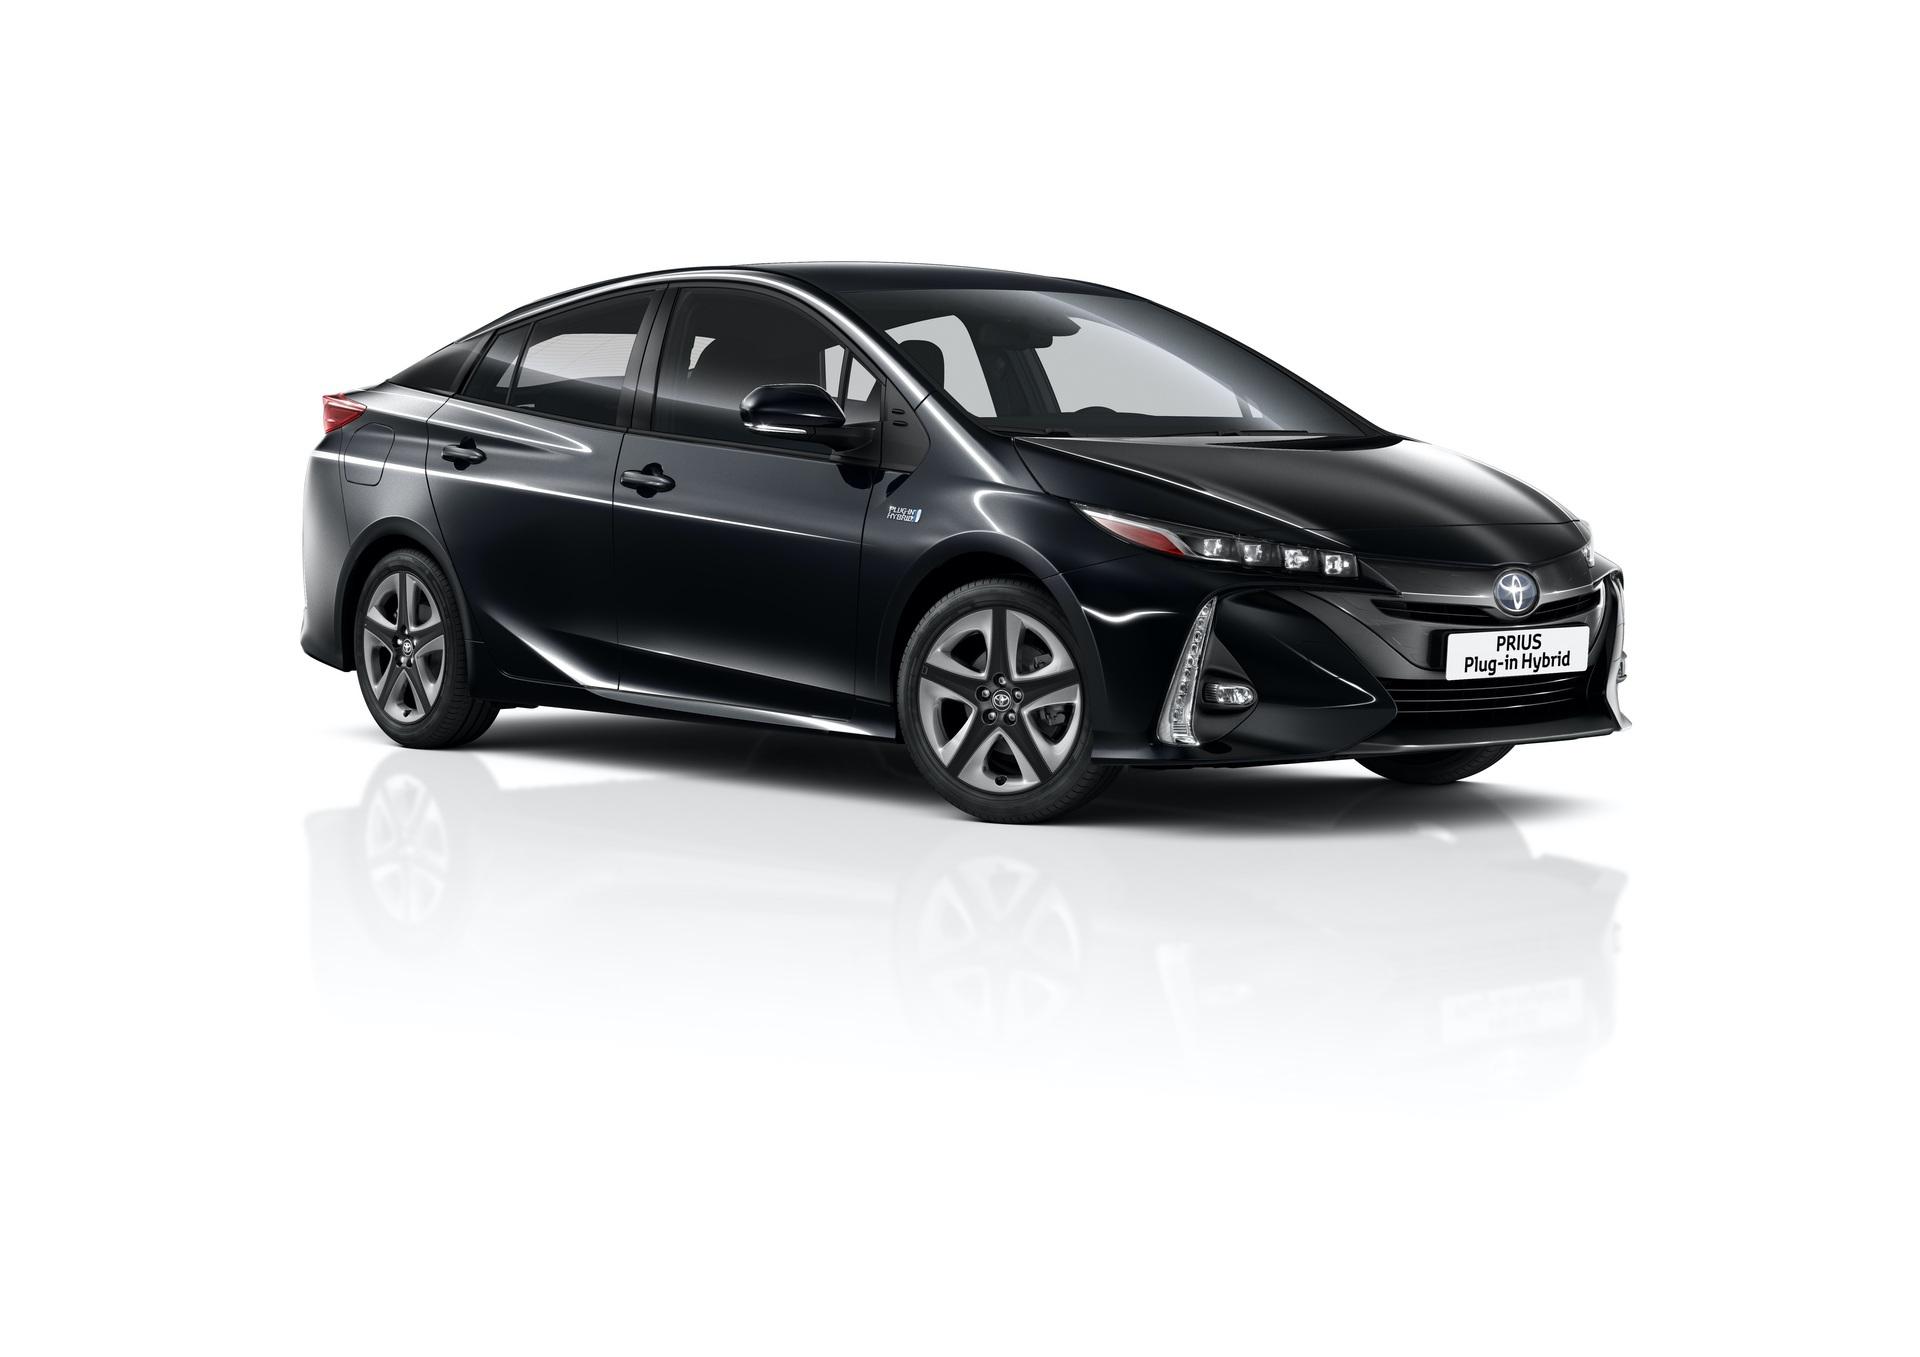 2019_Toyota_Prius_Plug-in_Hybrid_0000